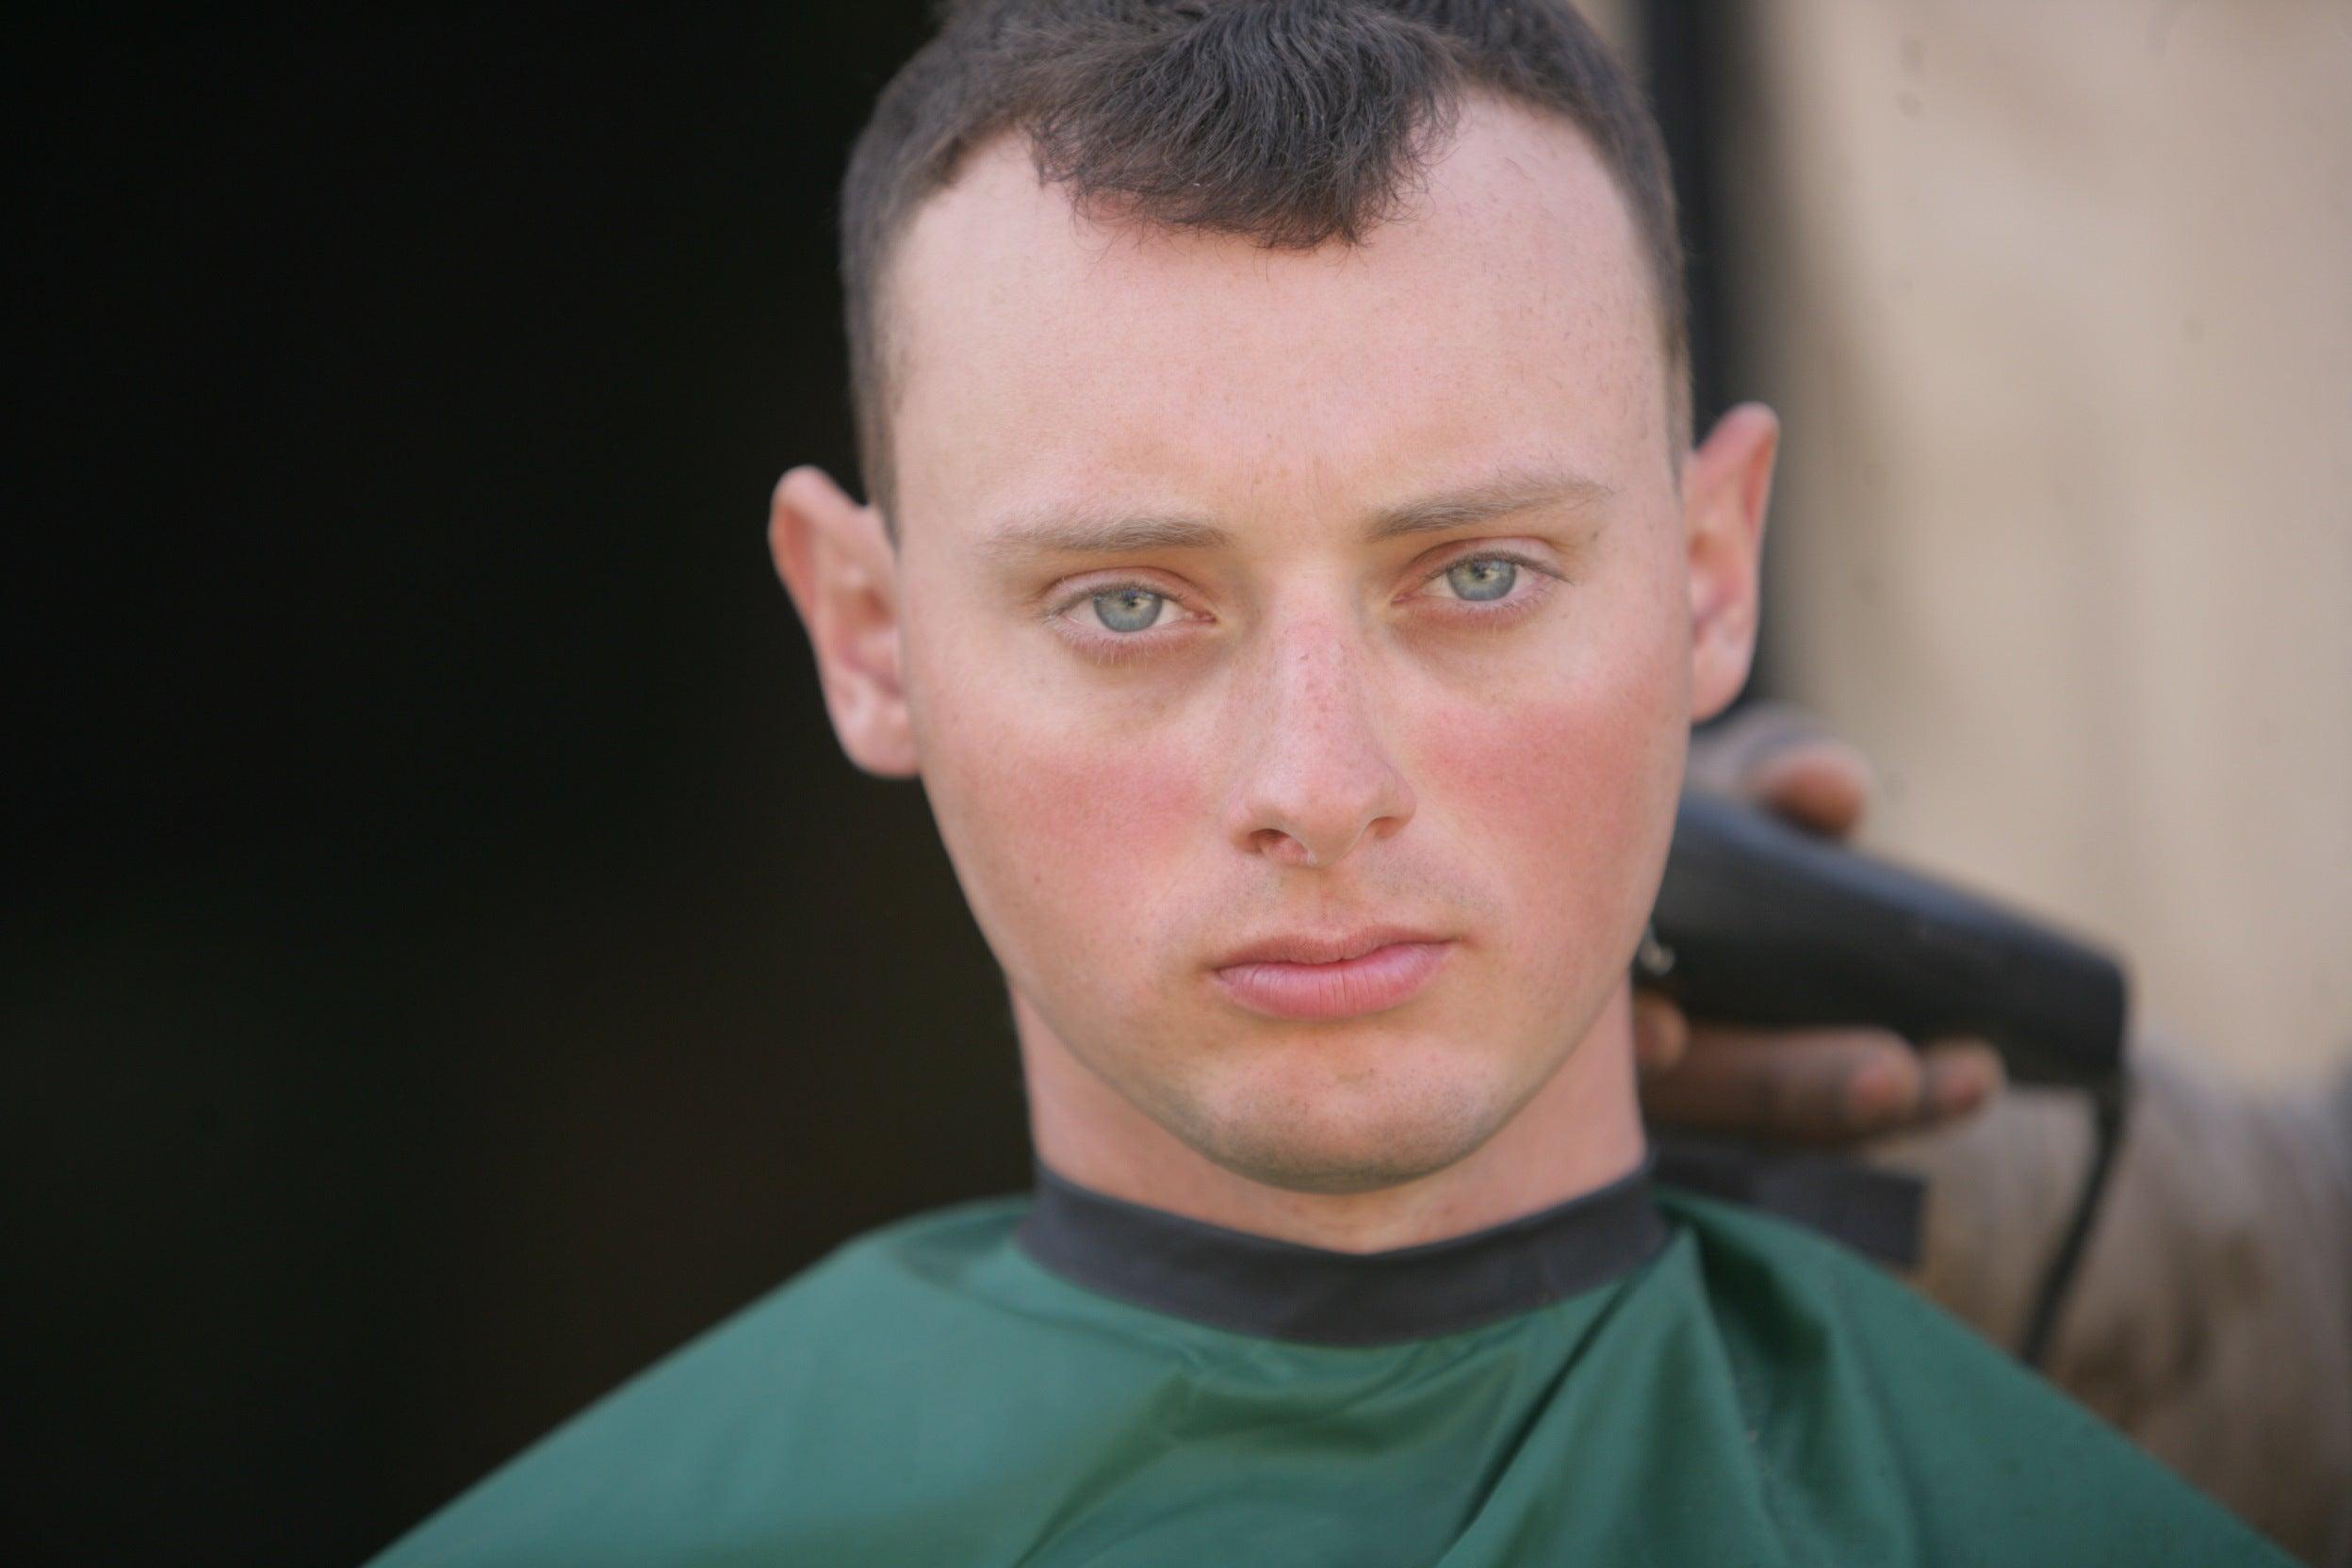 Innovative Marine Corps Hairc